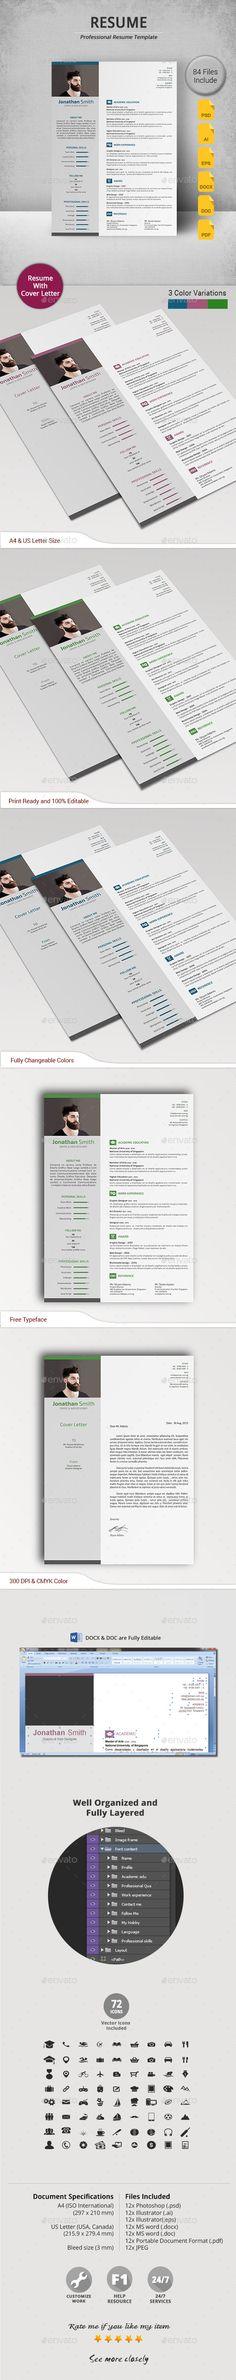 Resume Word Resume template download, Modern resume template and - professional resume template download